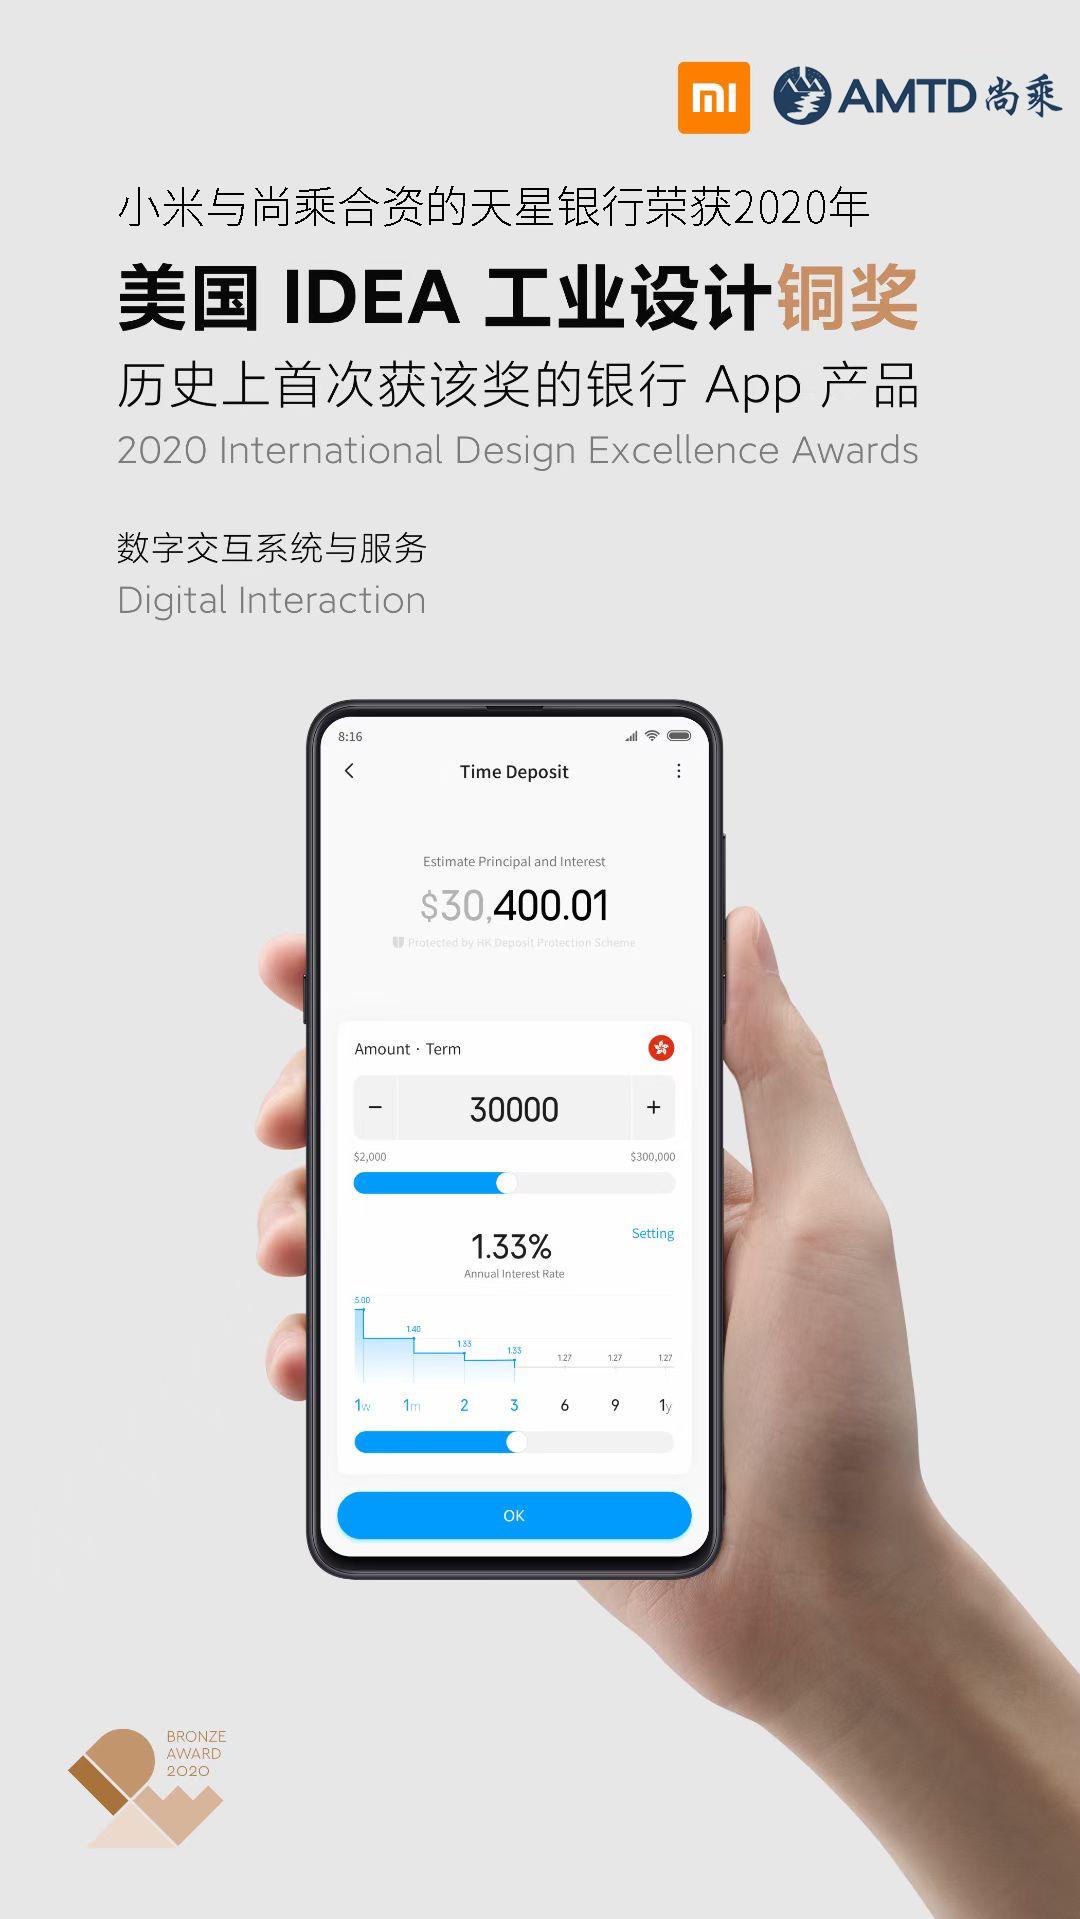 AMTD News | Airstar Bank won 2020 International Design Excellence Award